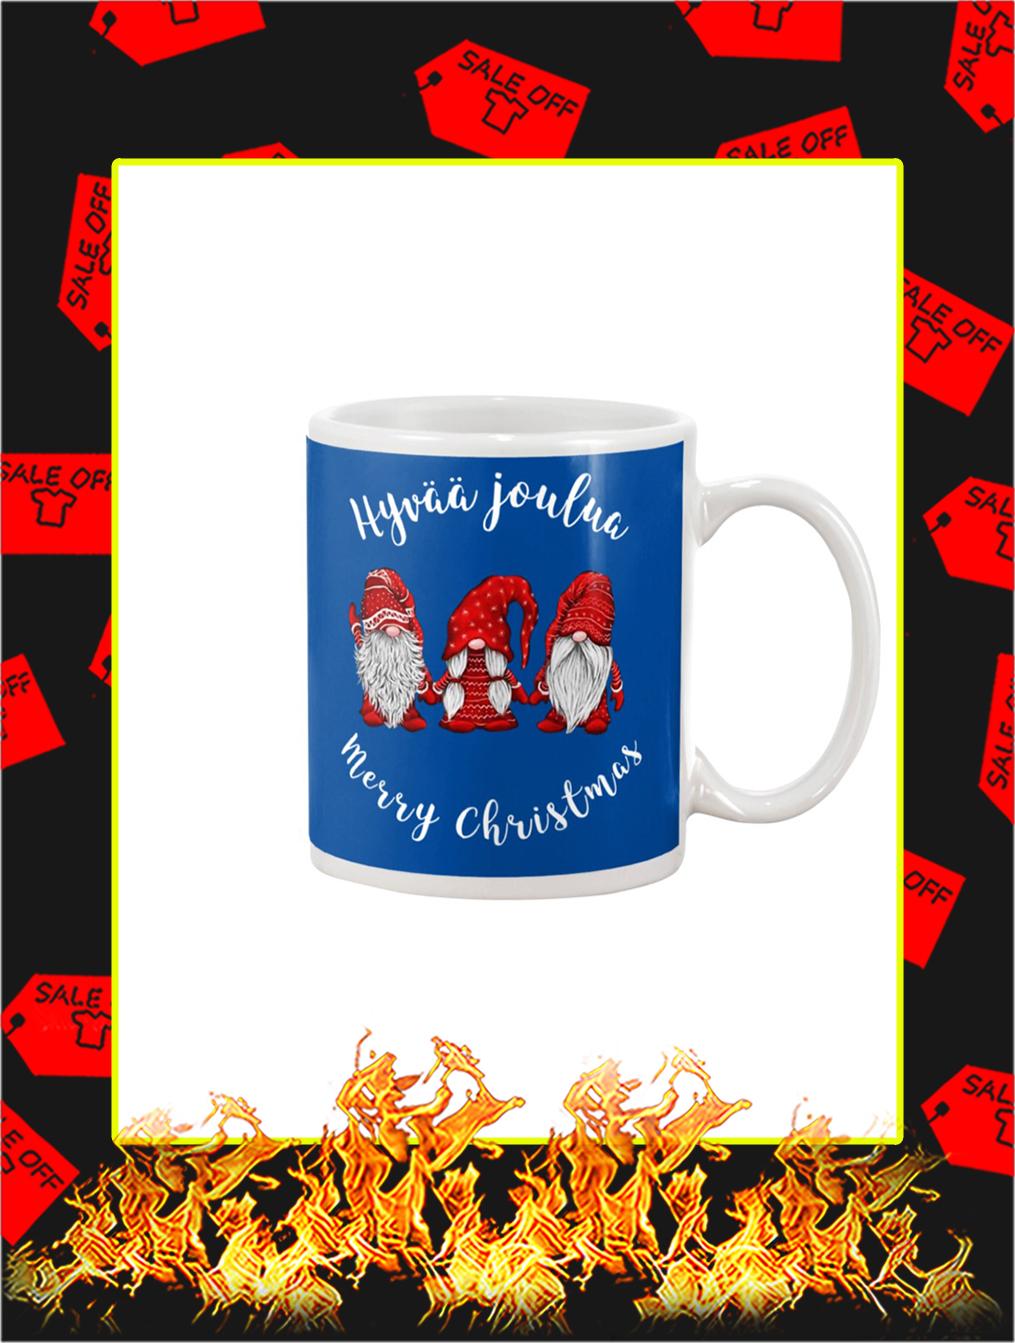 Gnomies Hyvaa Joulua Merry Christmas Mug- blue